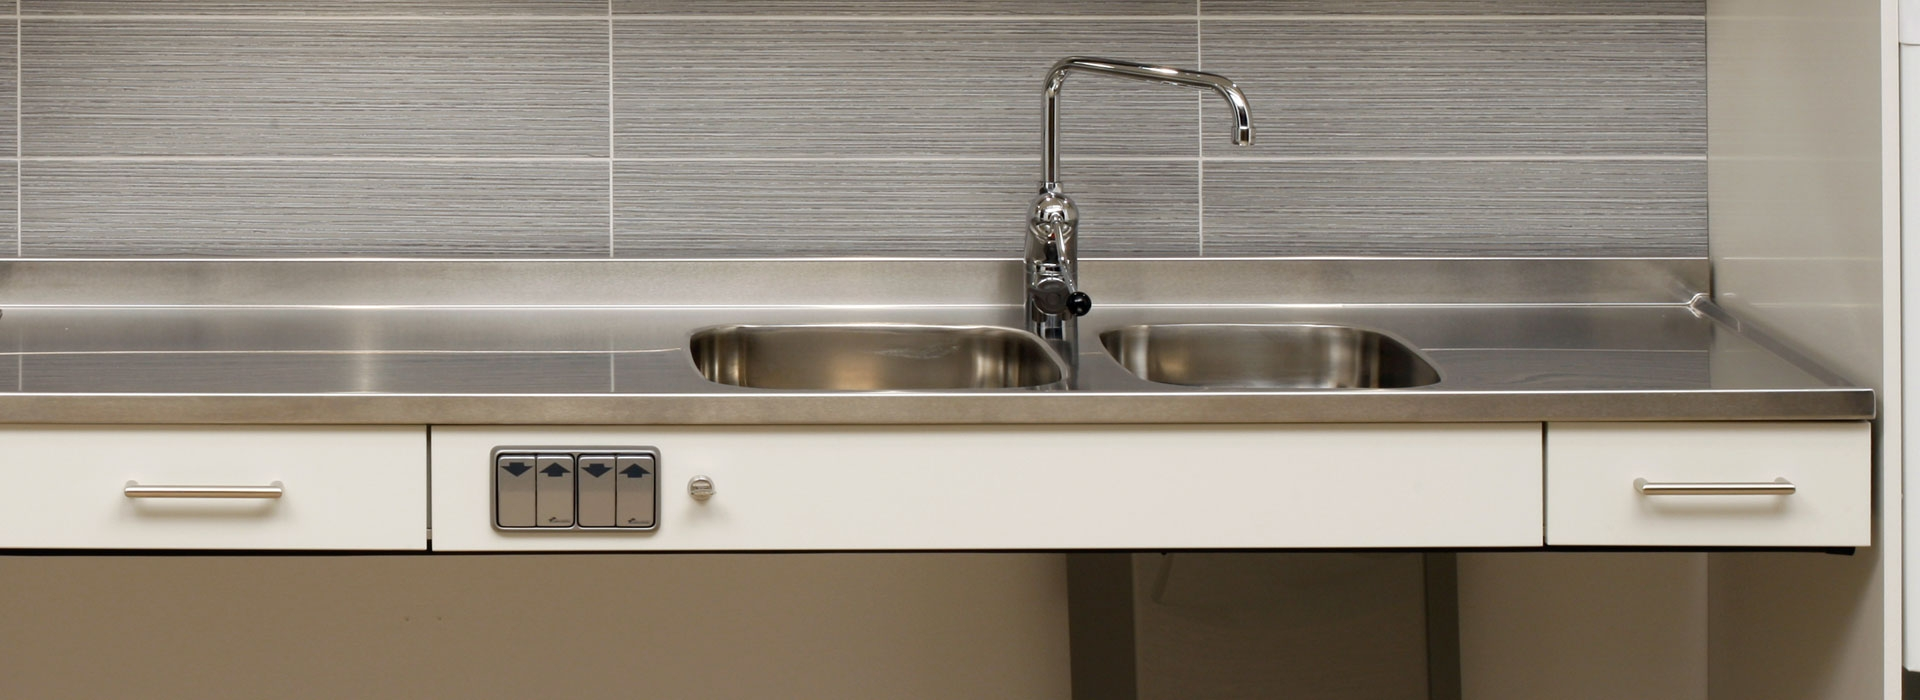 Sinks Amp Taps Height Adjustable Kitchen Systems